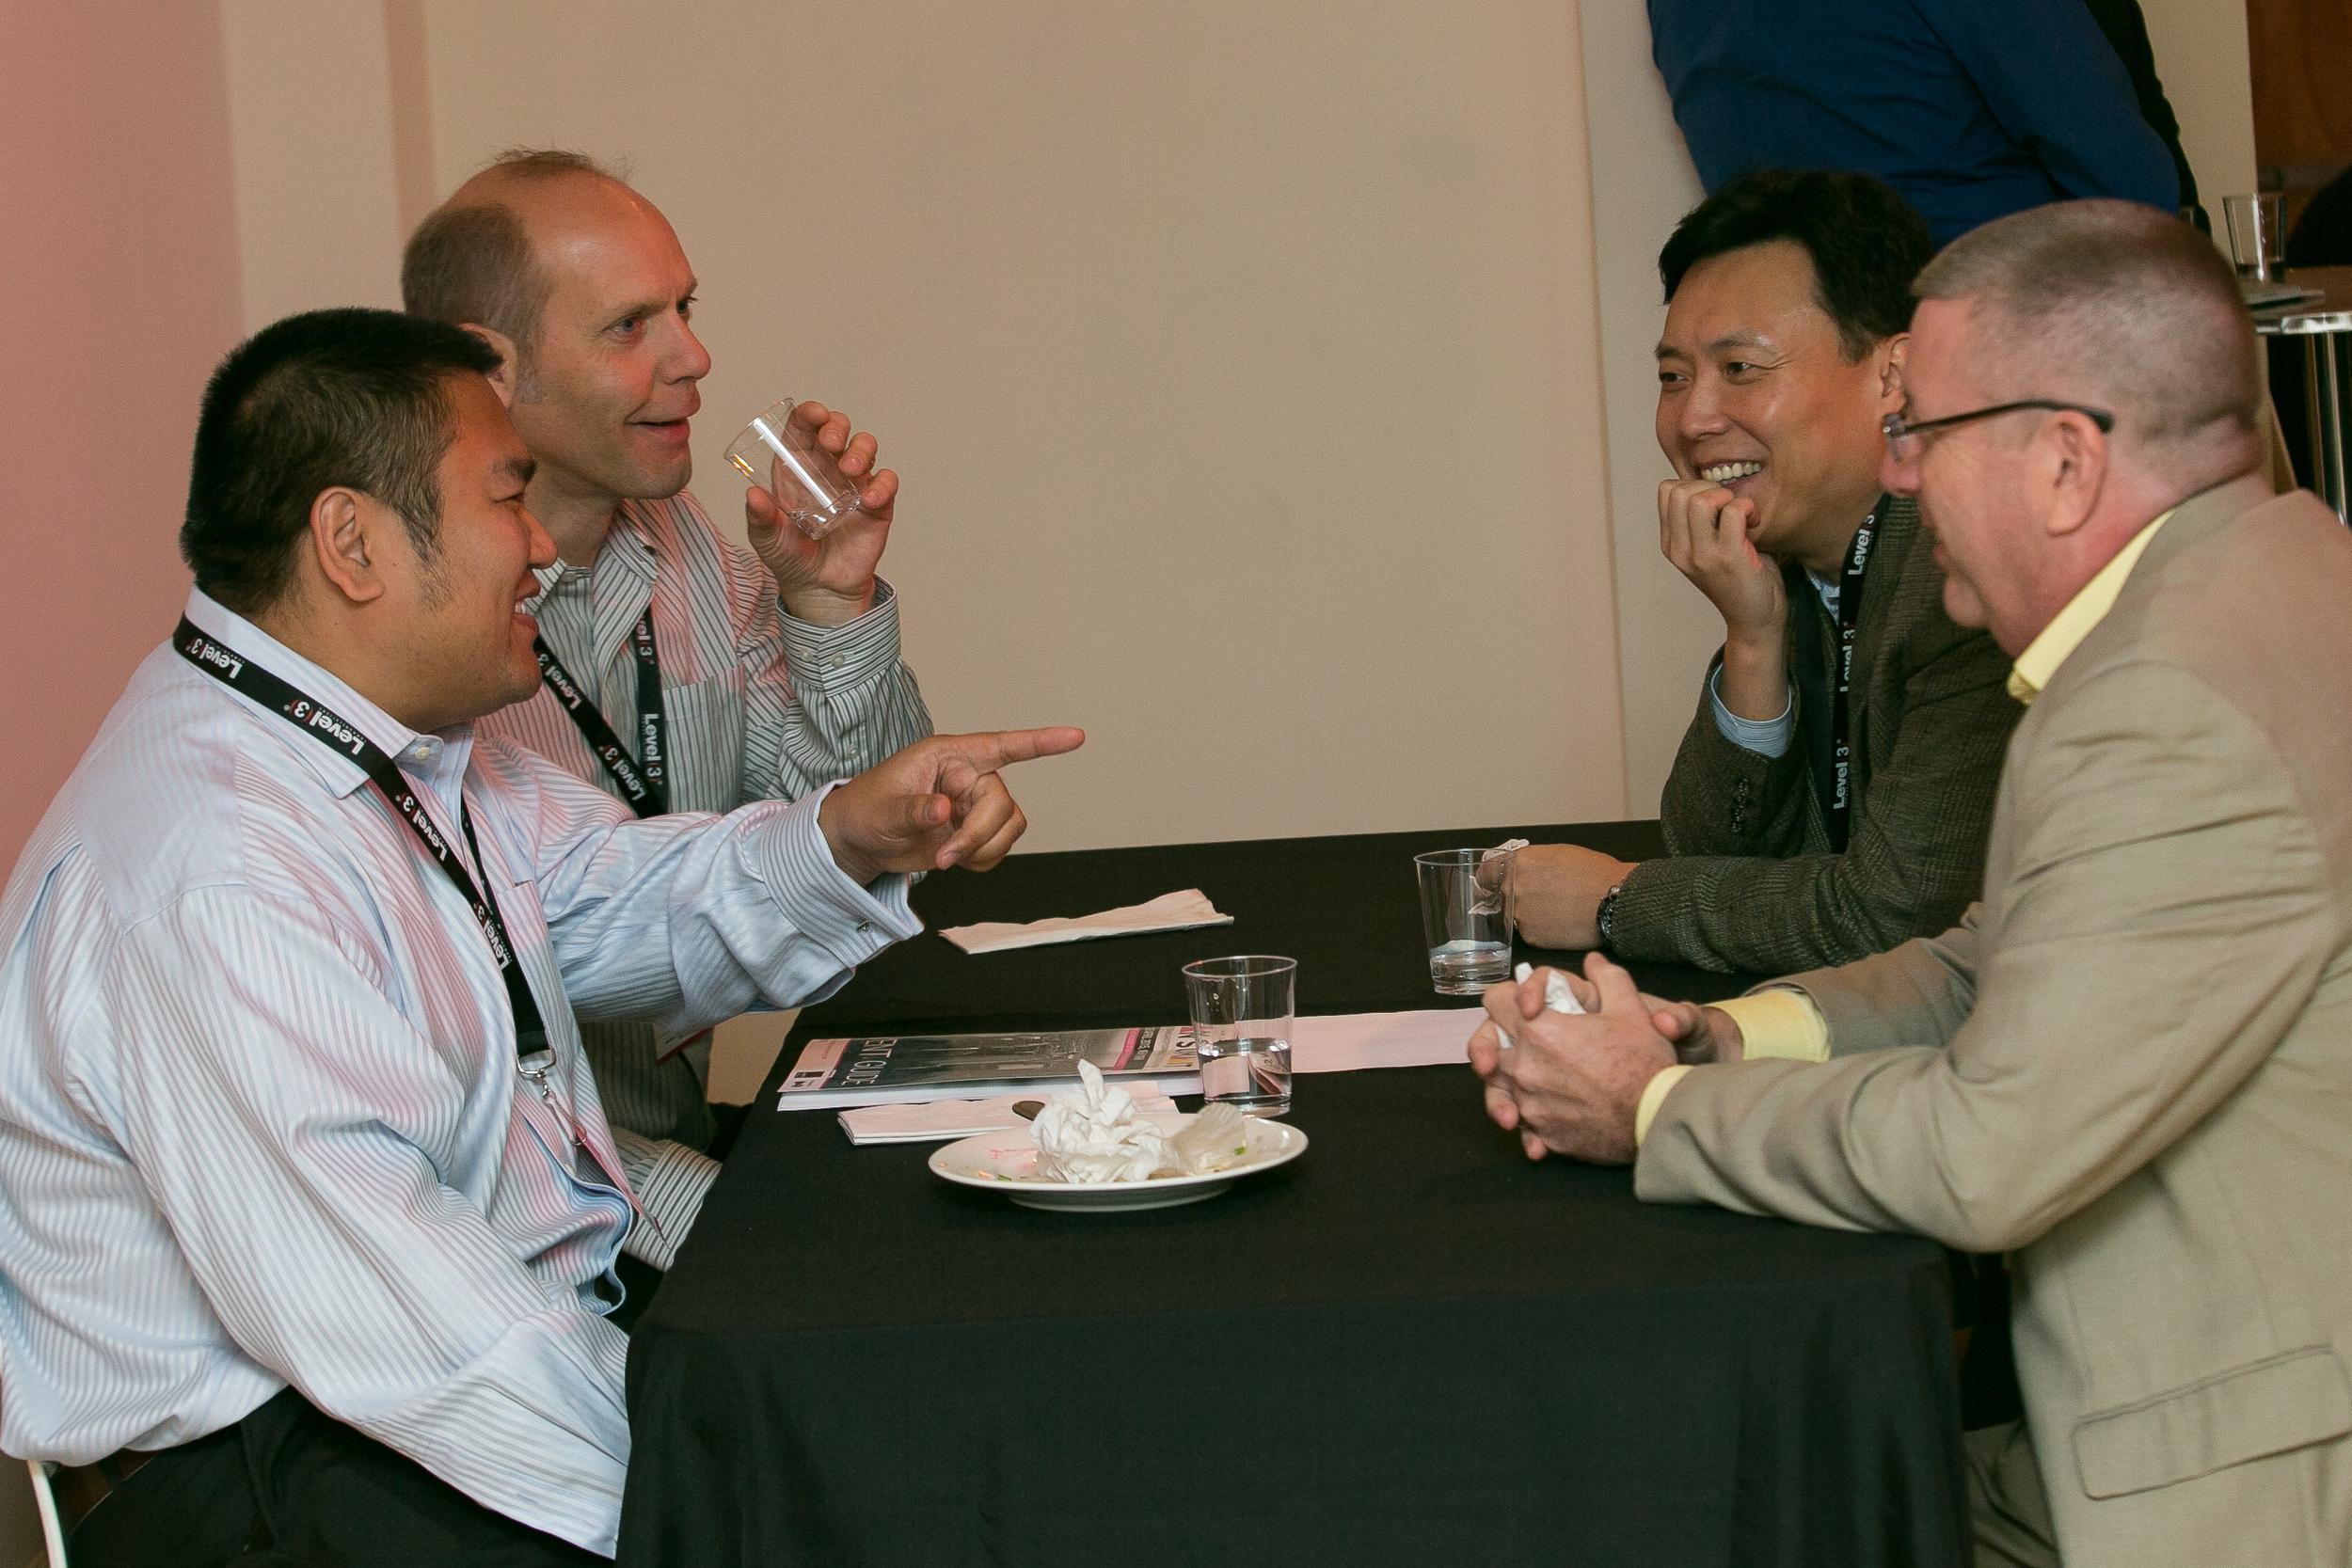 022-Capacity_Conferences-WAN_Summit-042715-6P9A0003.jpg